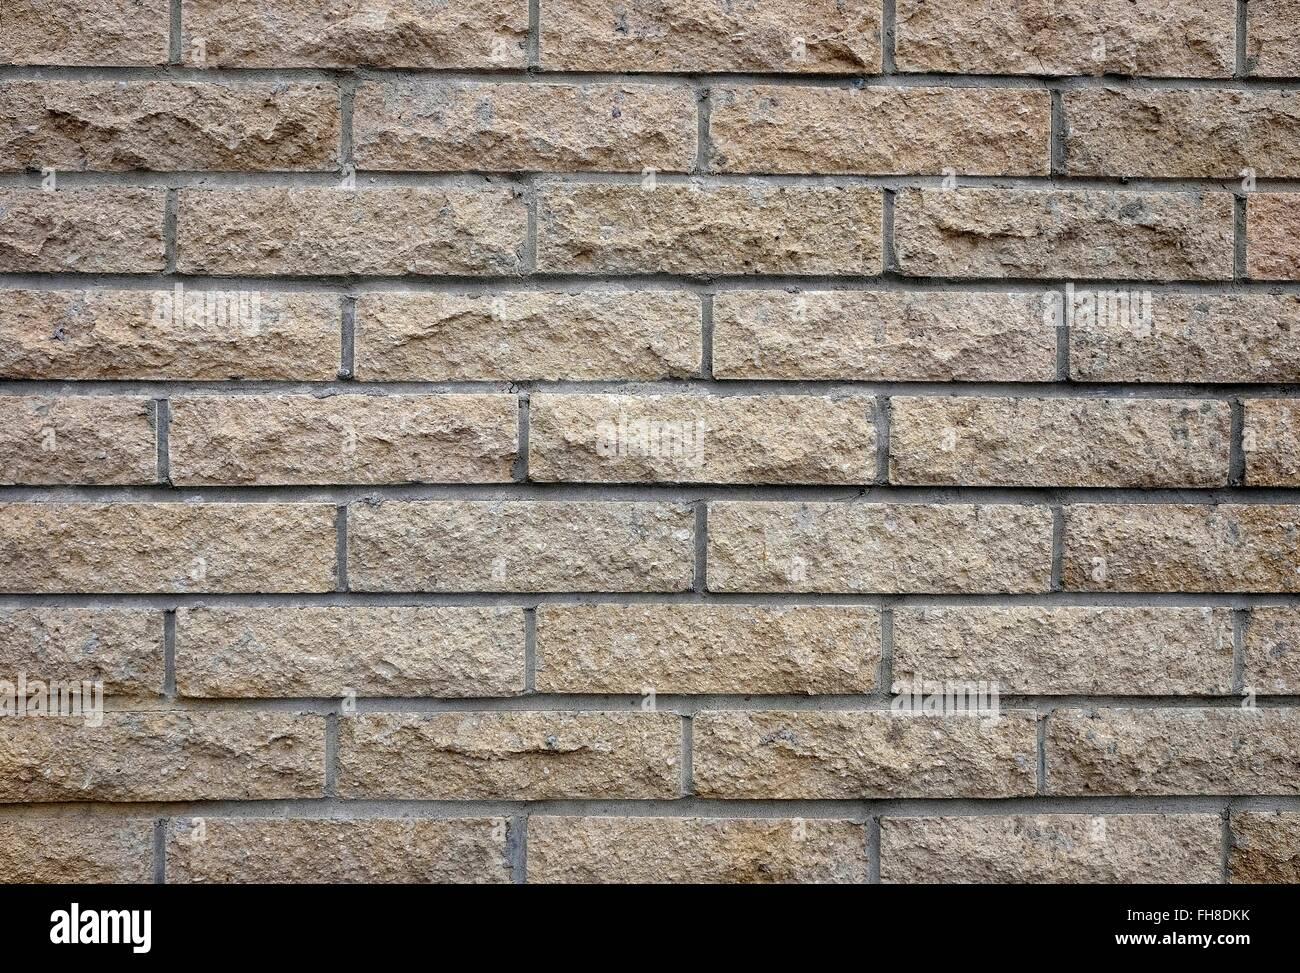 D texture materie zum anfassen floornature